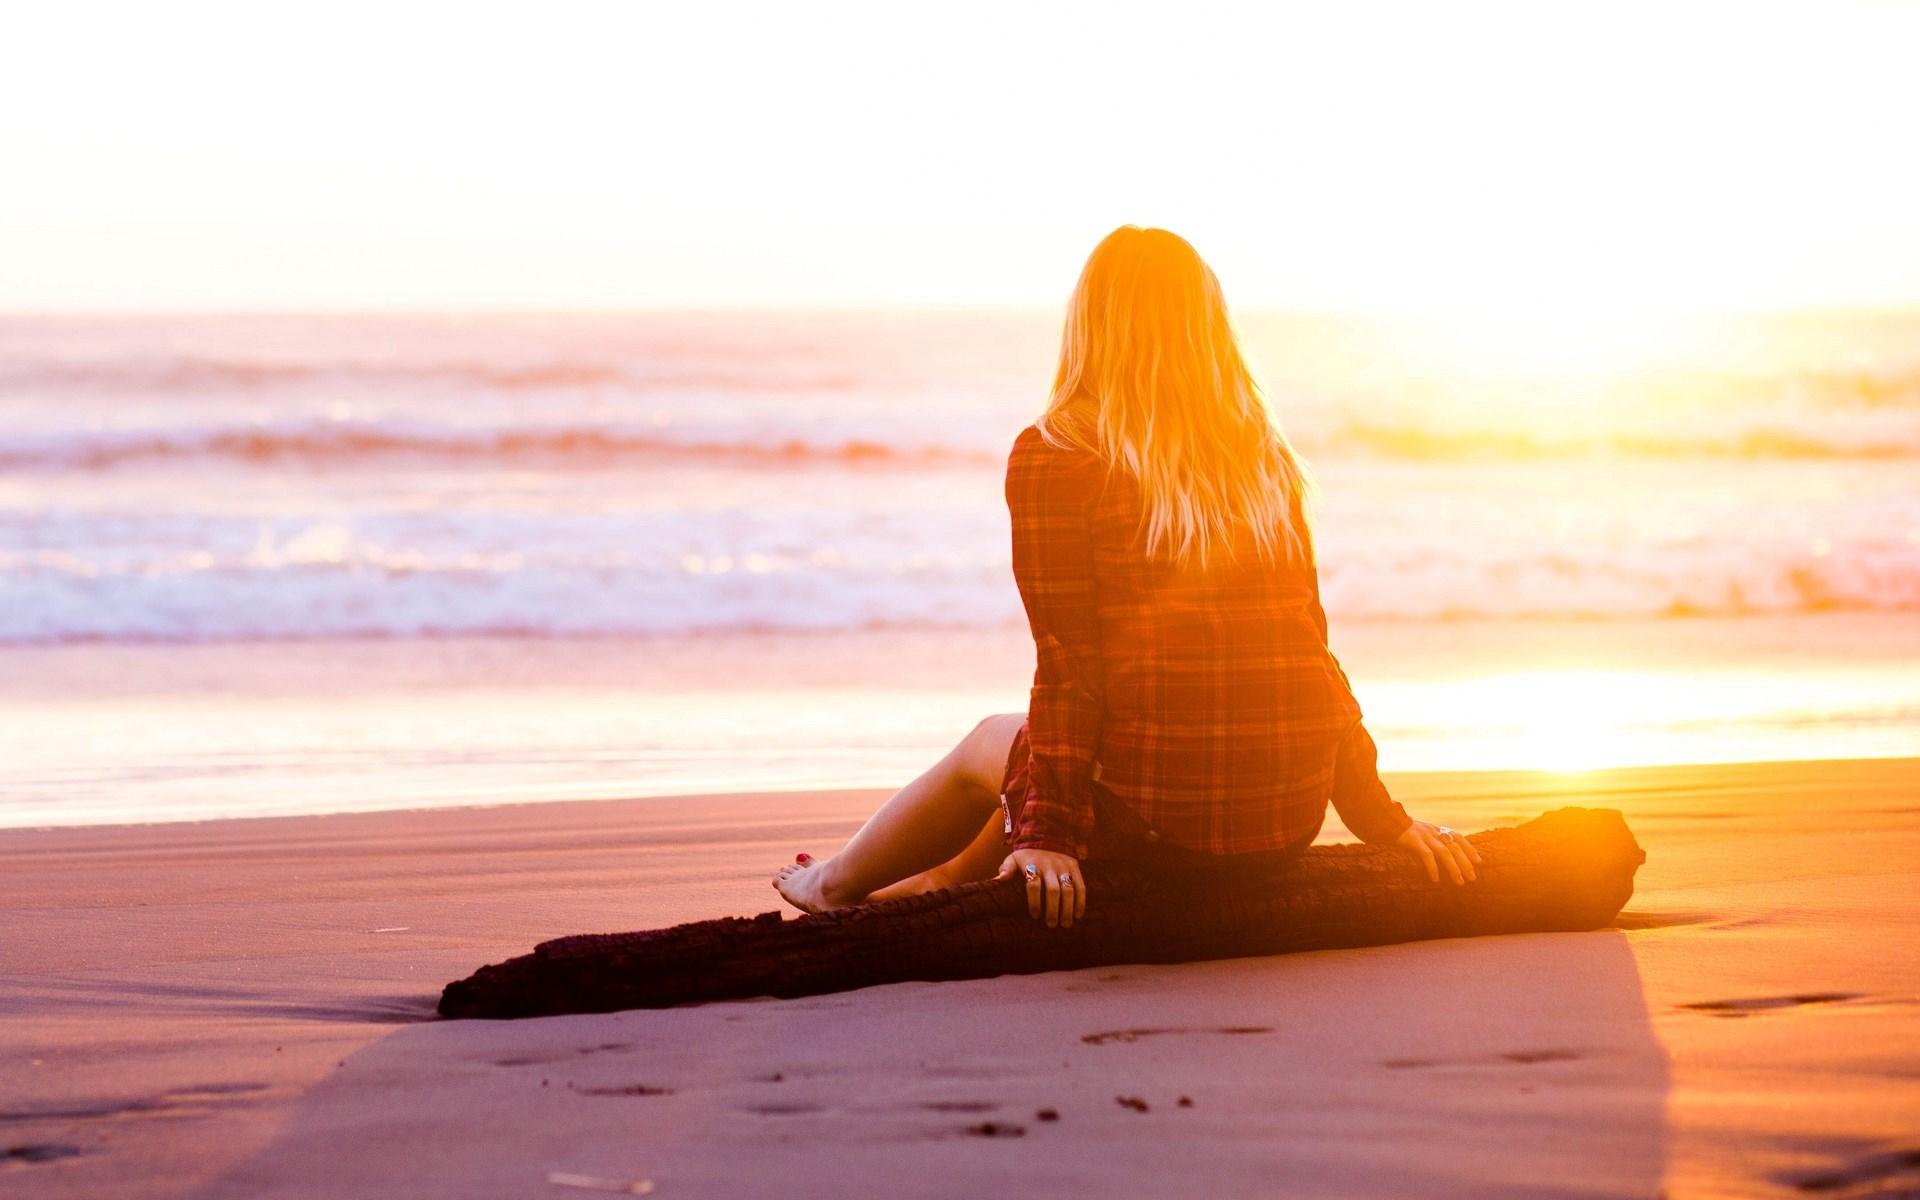 Mood Girl Blonde Sitting Dreams Sand Beach Summer Sea